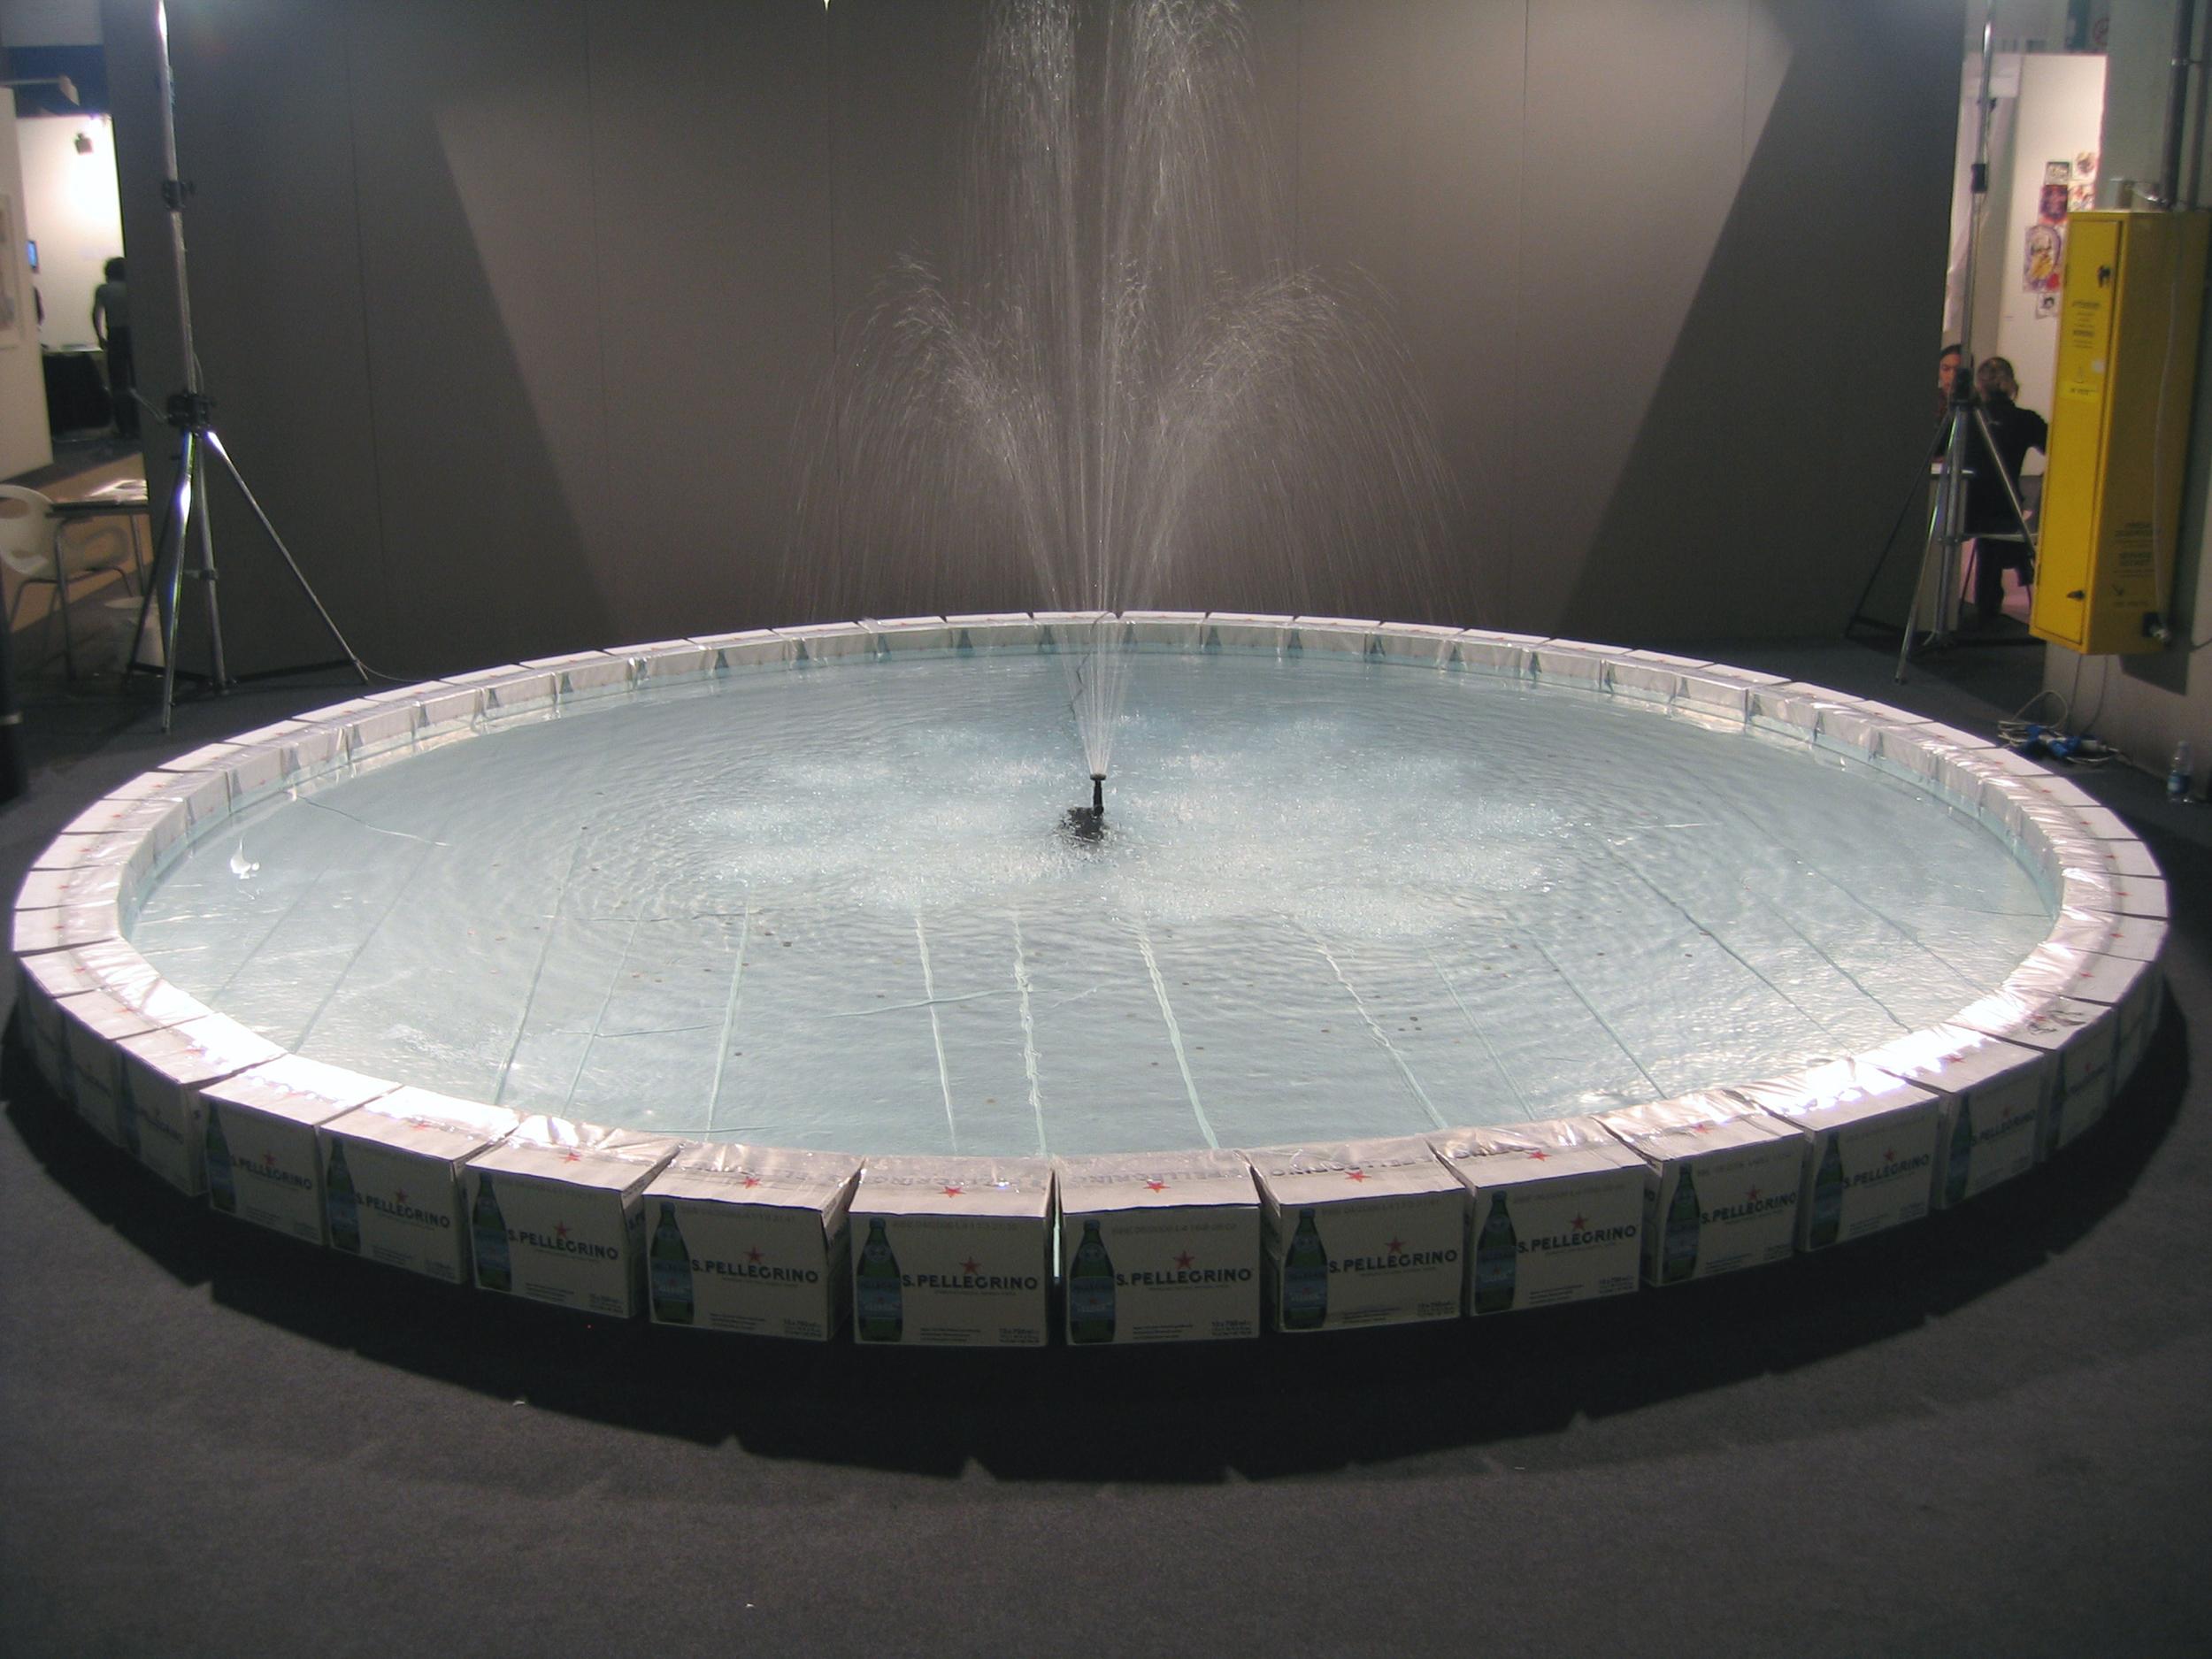 S. Pellegrino Fountain